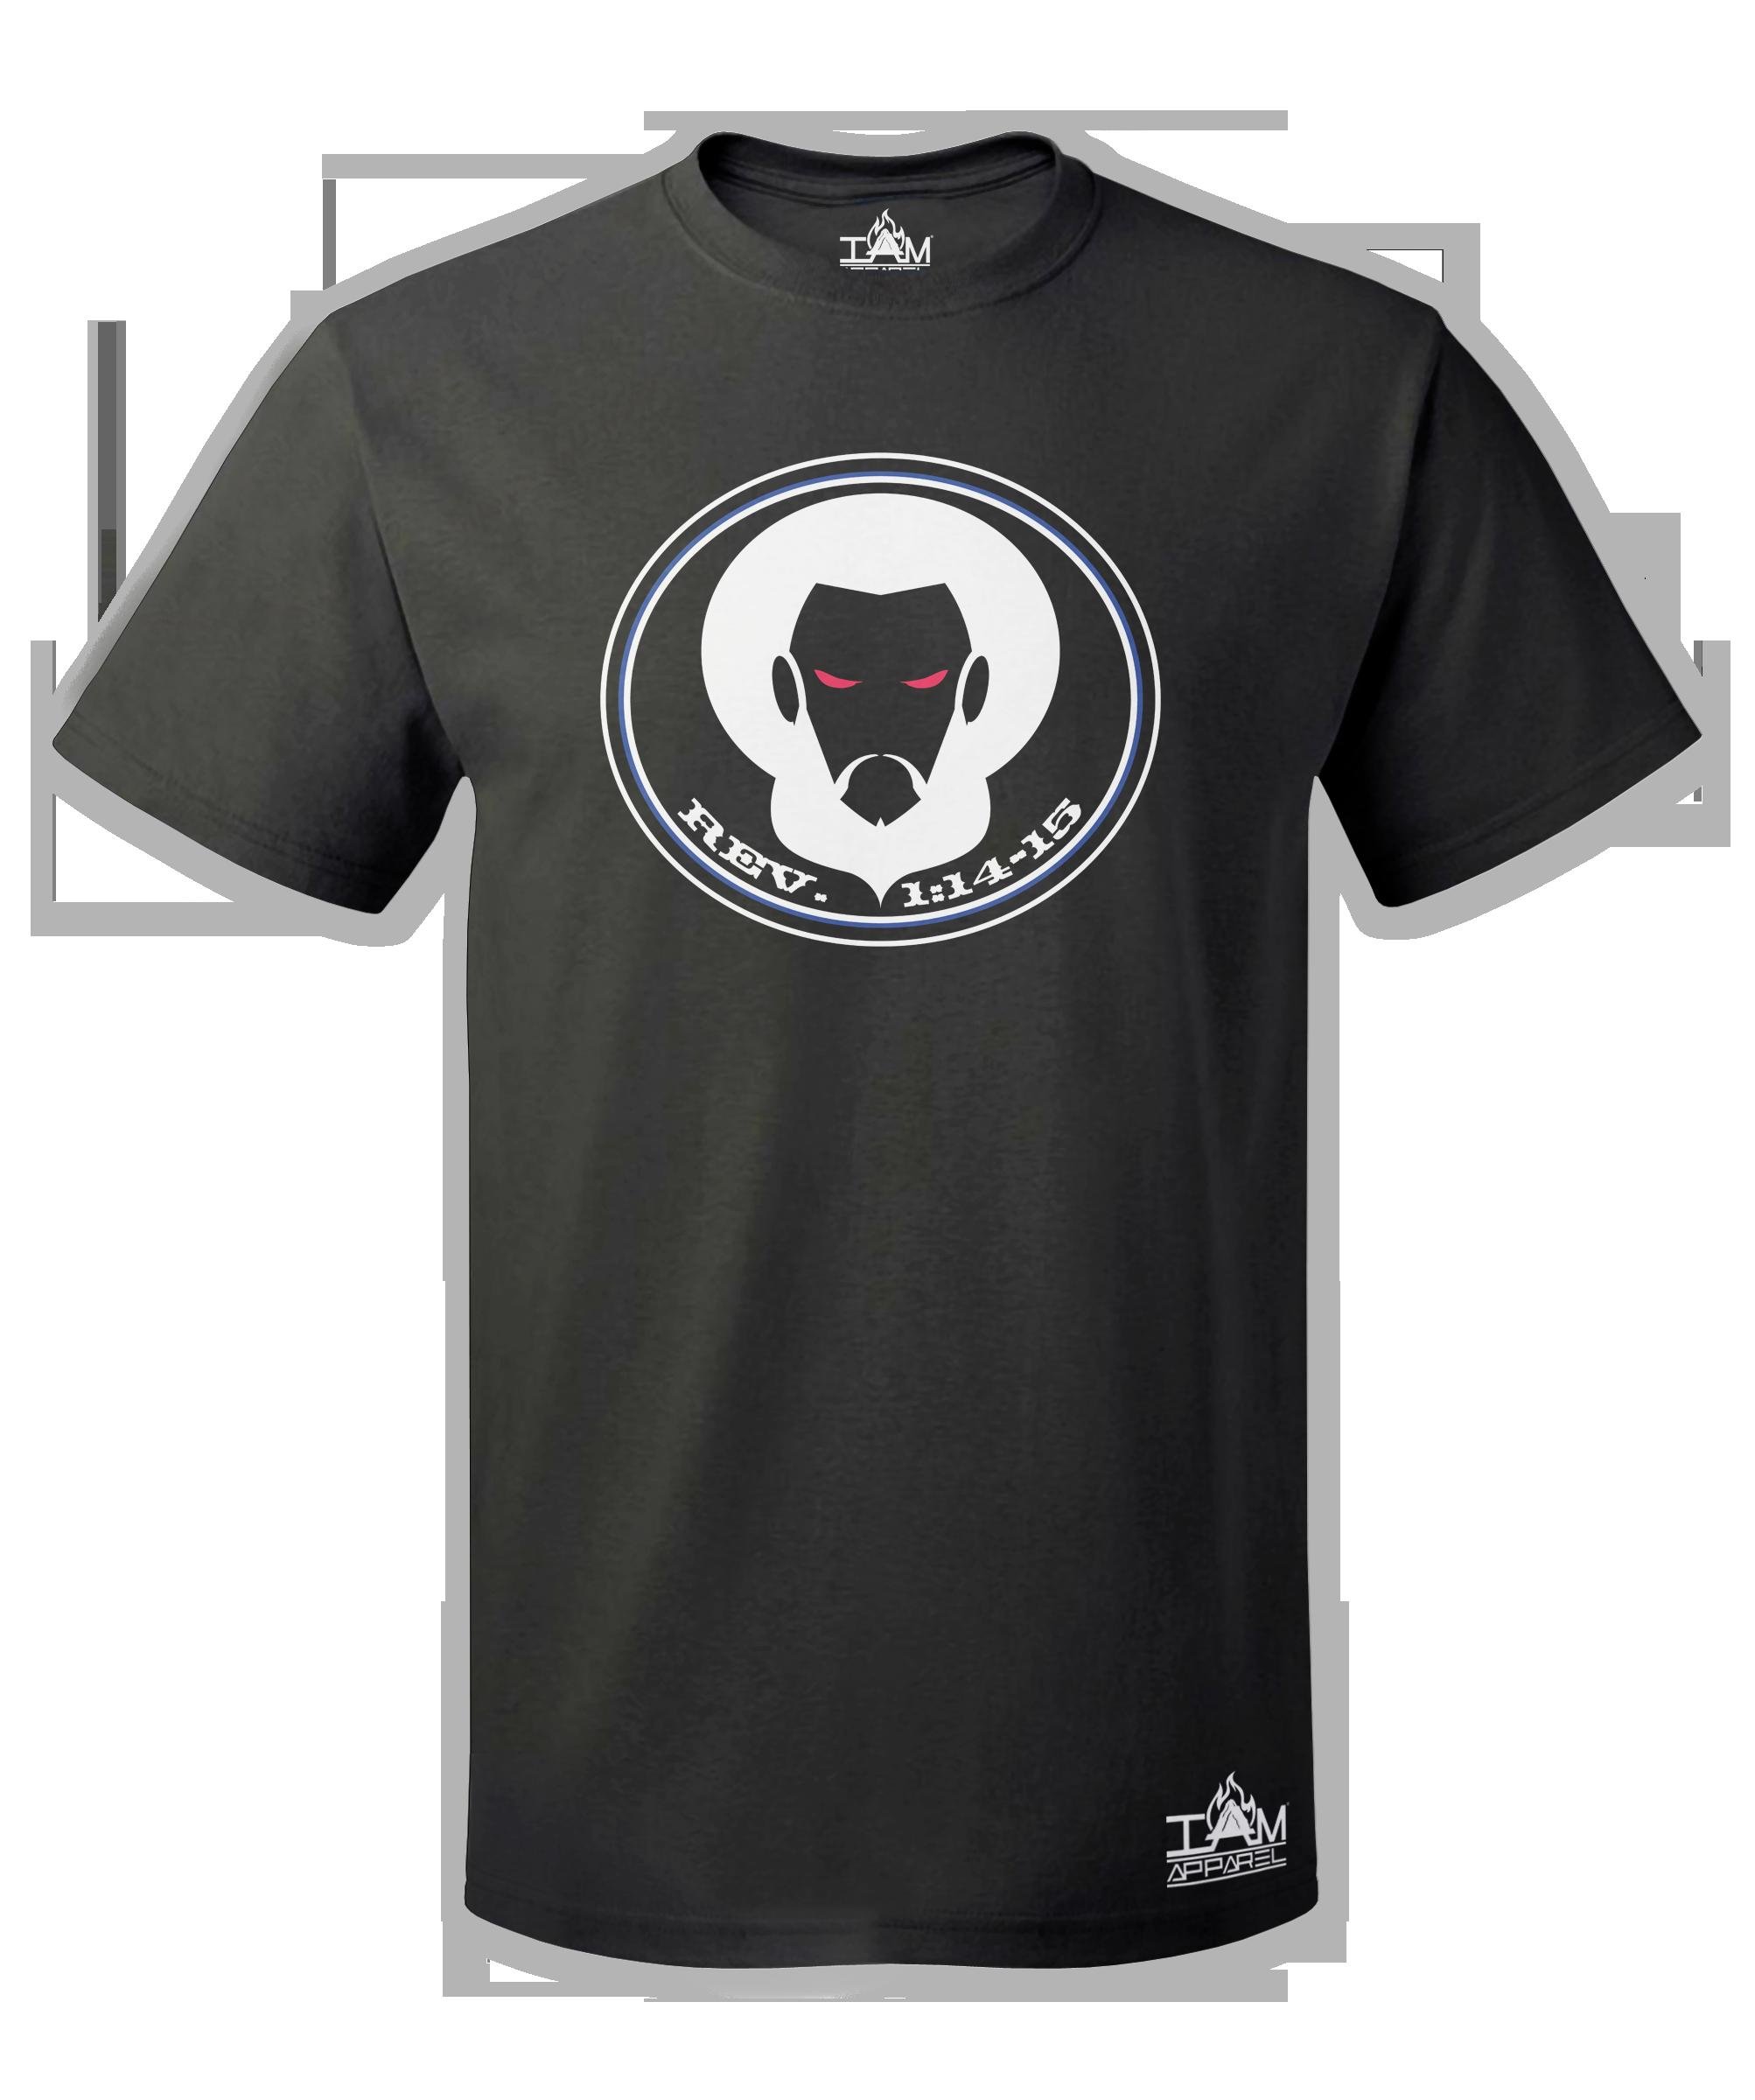 GOCC Men's Short Sleeved with image of Christ Black T-Shirt 00063